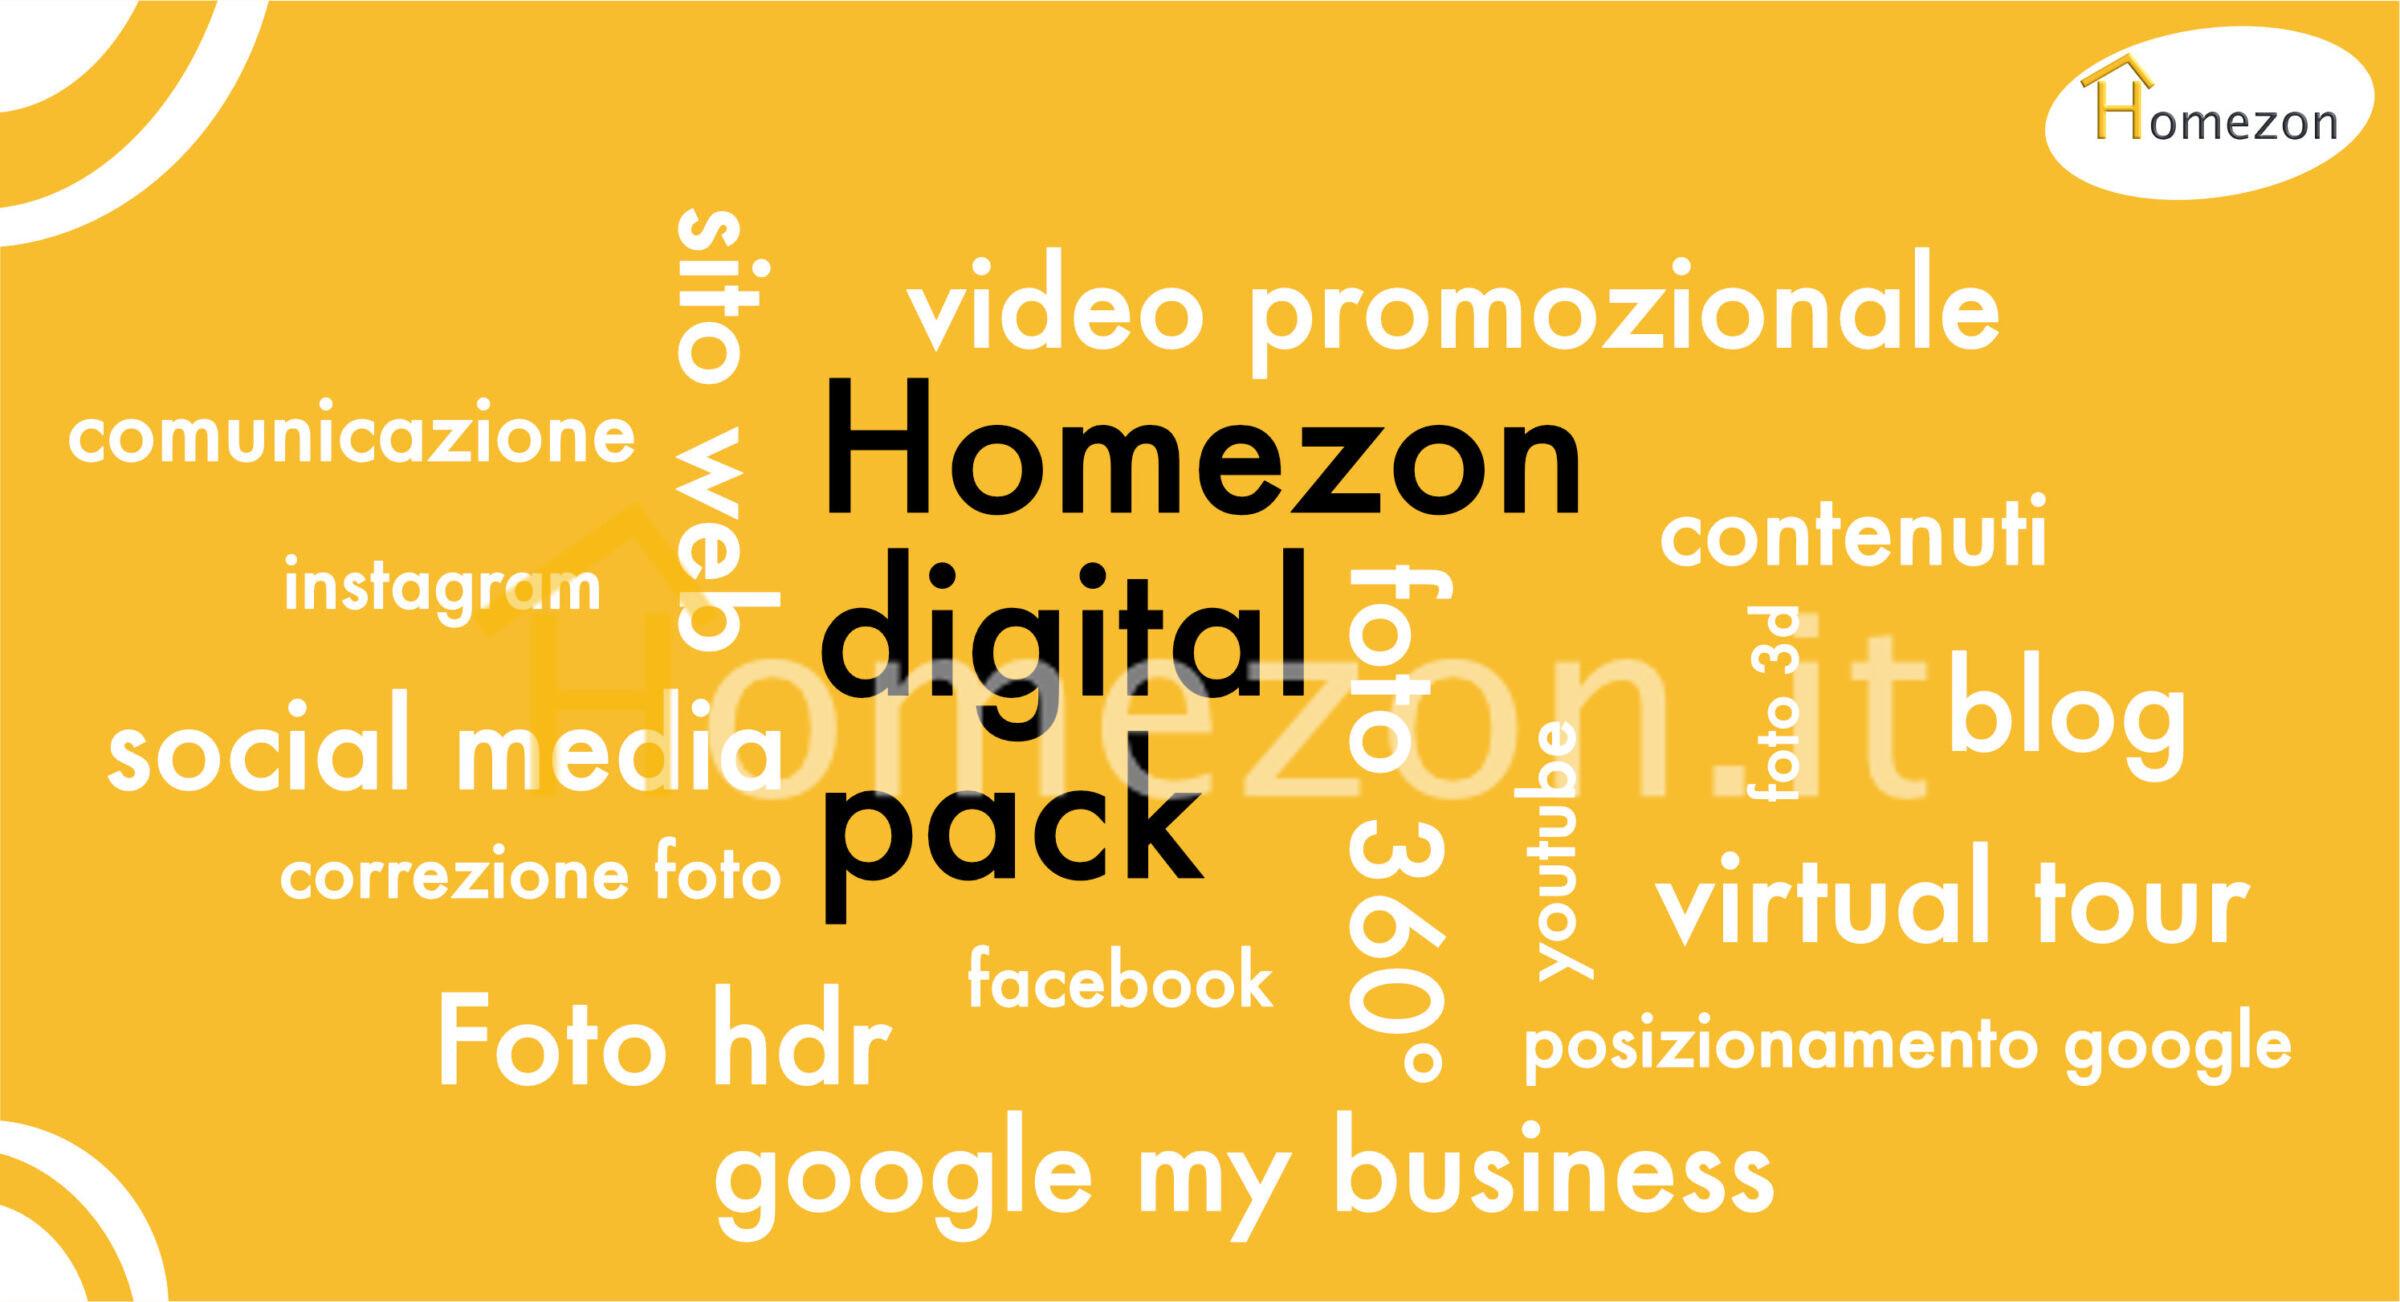 Homezon digital pack